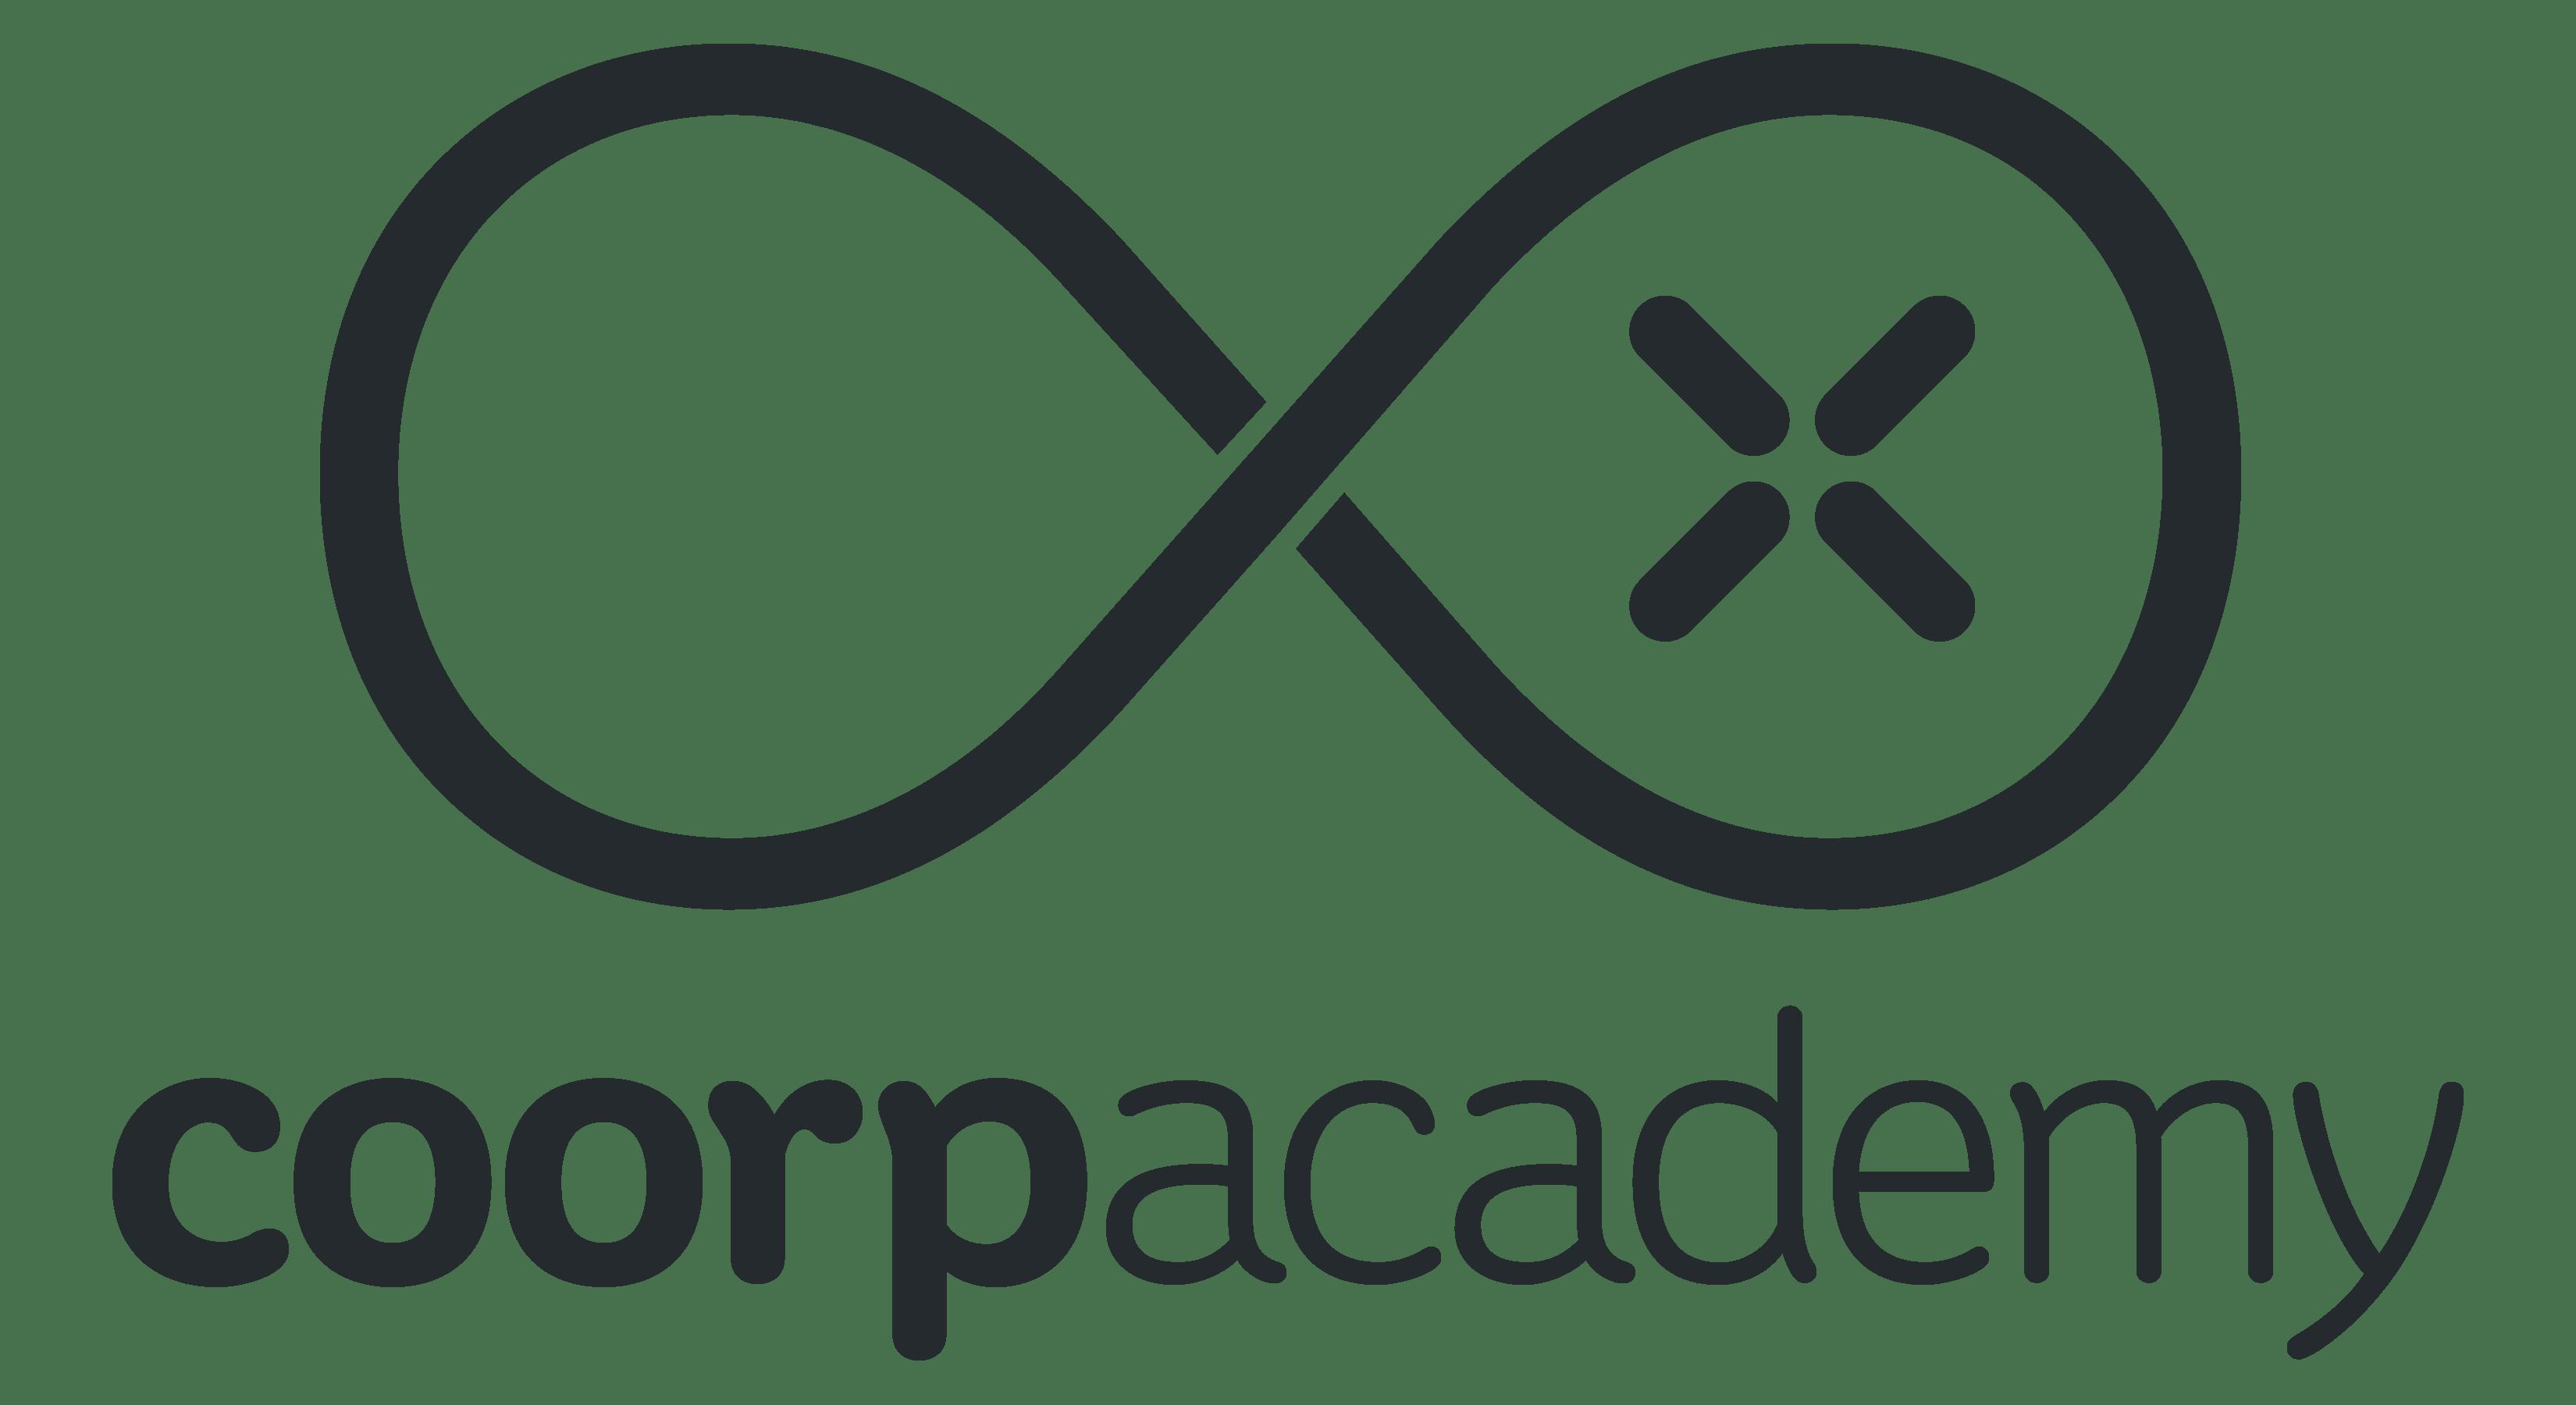 Logo Coorp academy